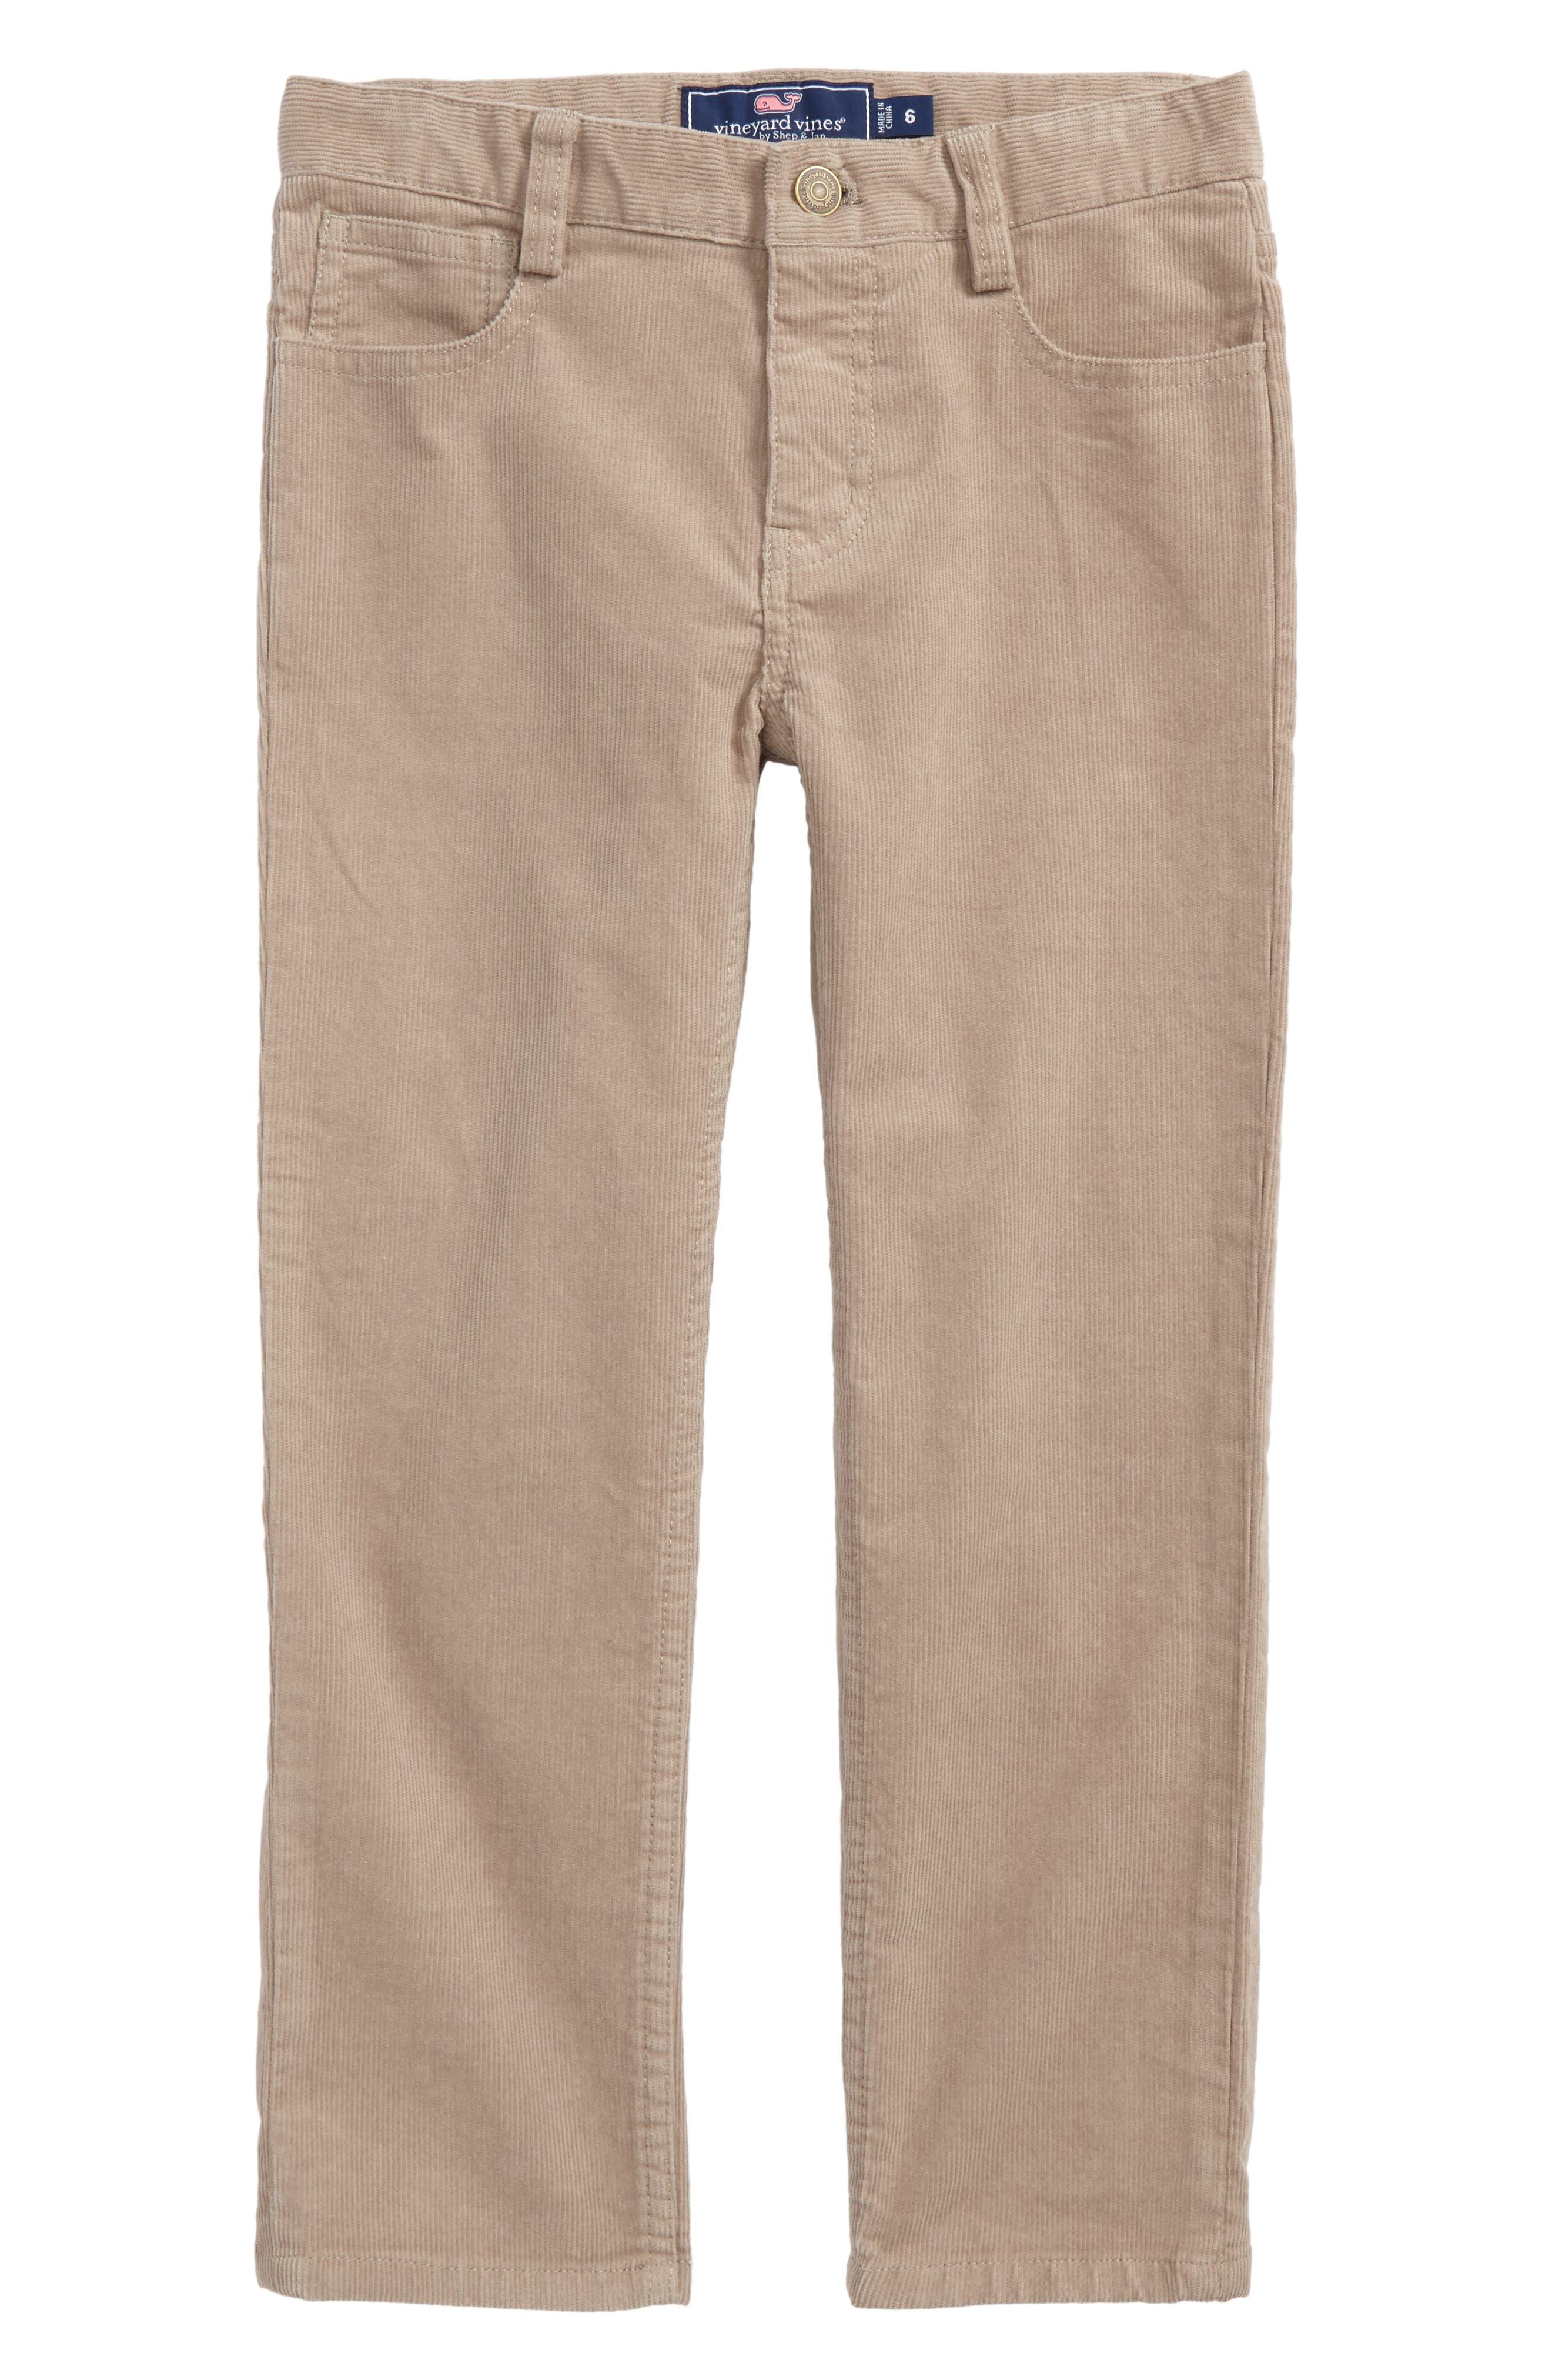 Corduroy Pants,                             Main thumbnail 1, color,                             Khaki